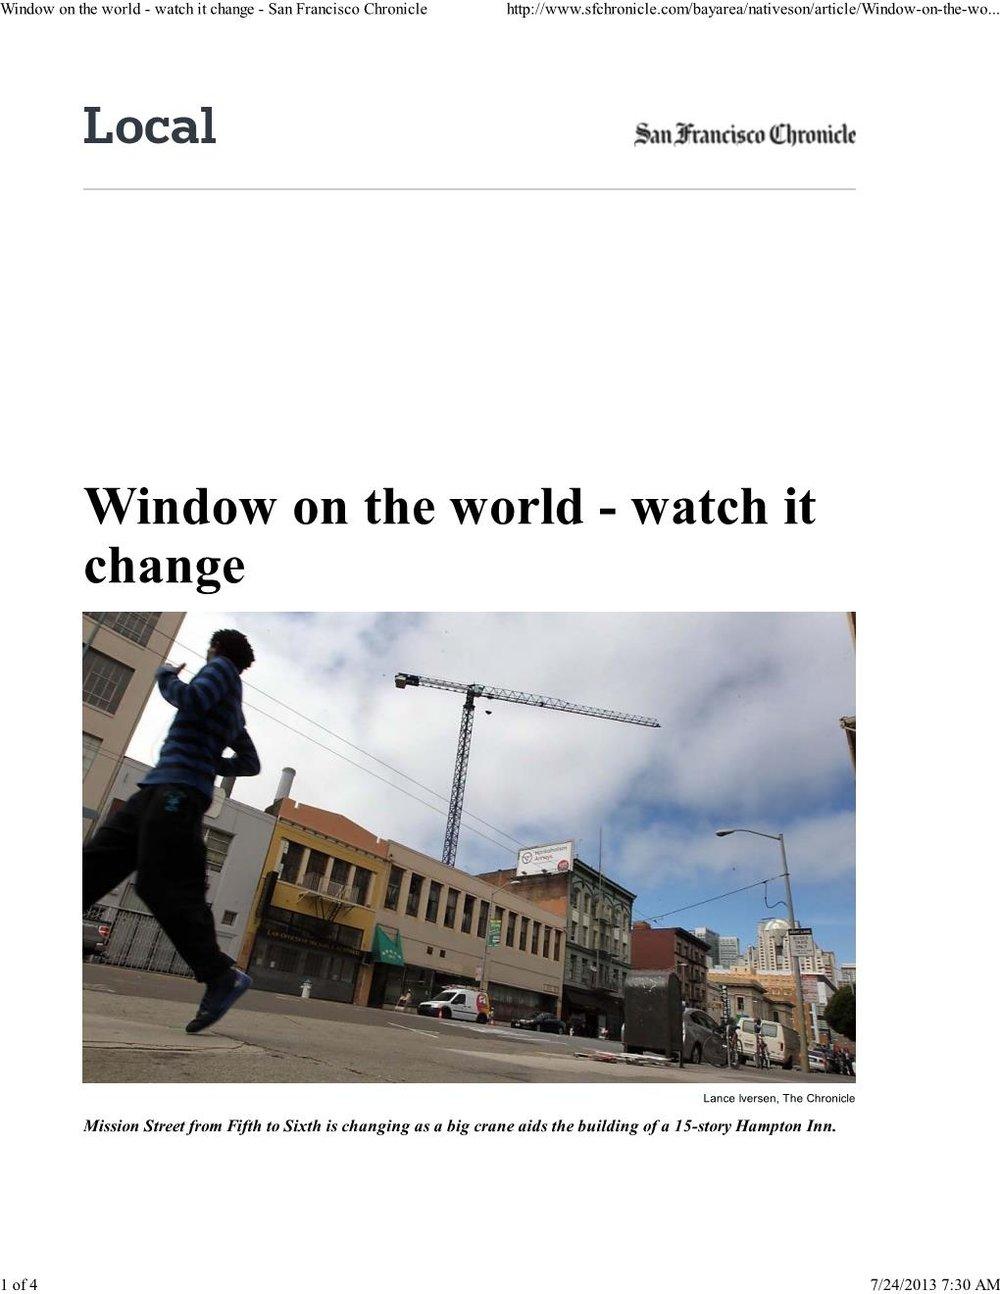 Window on the world - watch it change - San Francisco Chronicle.jpg